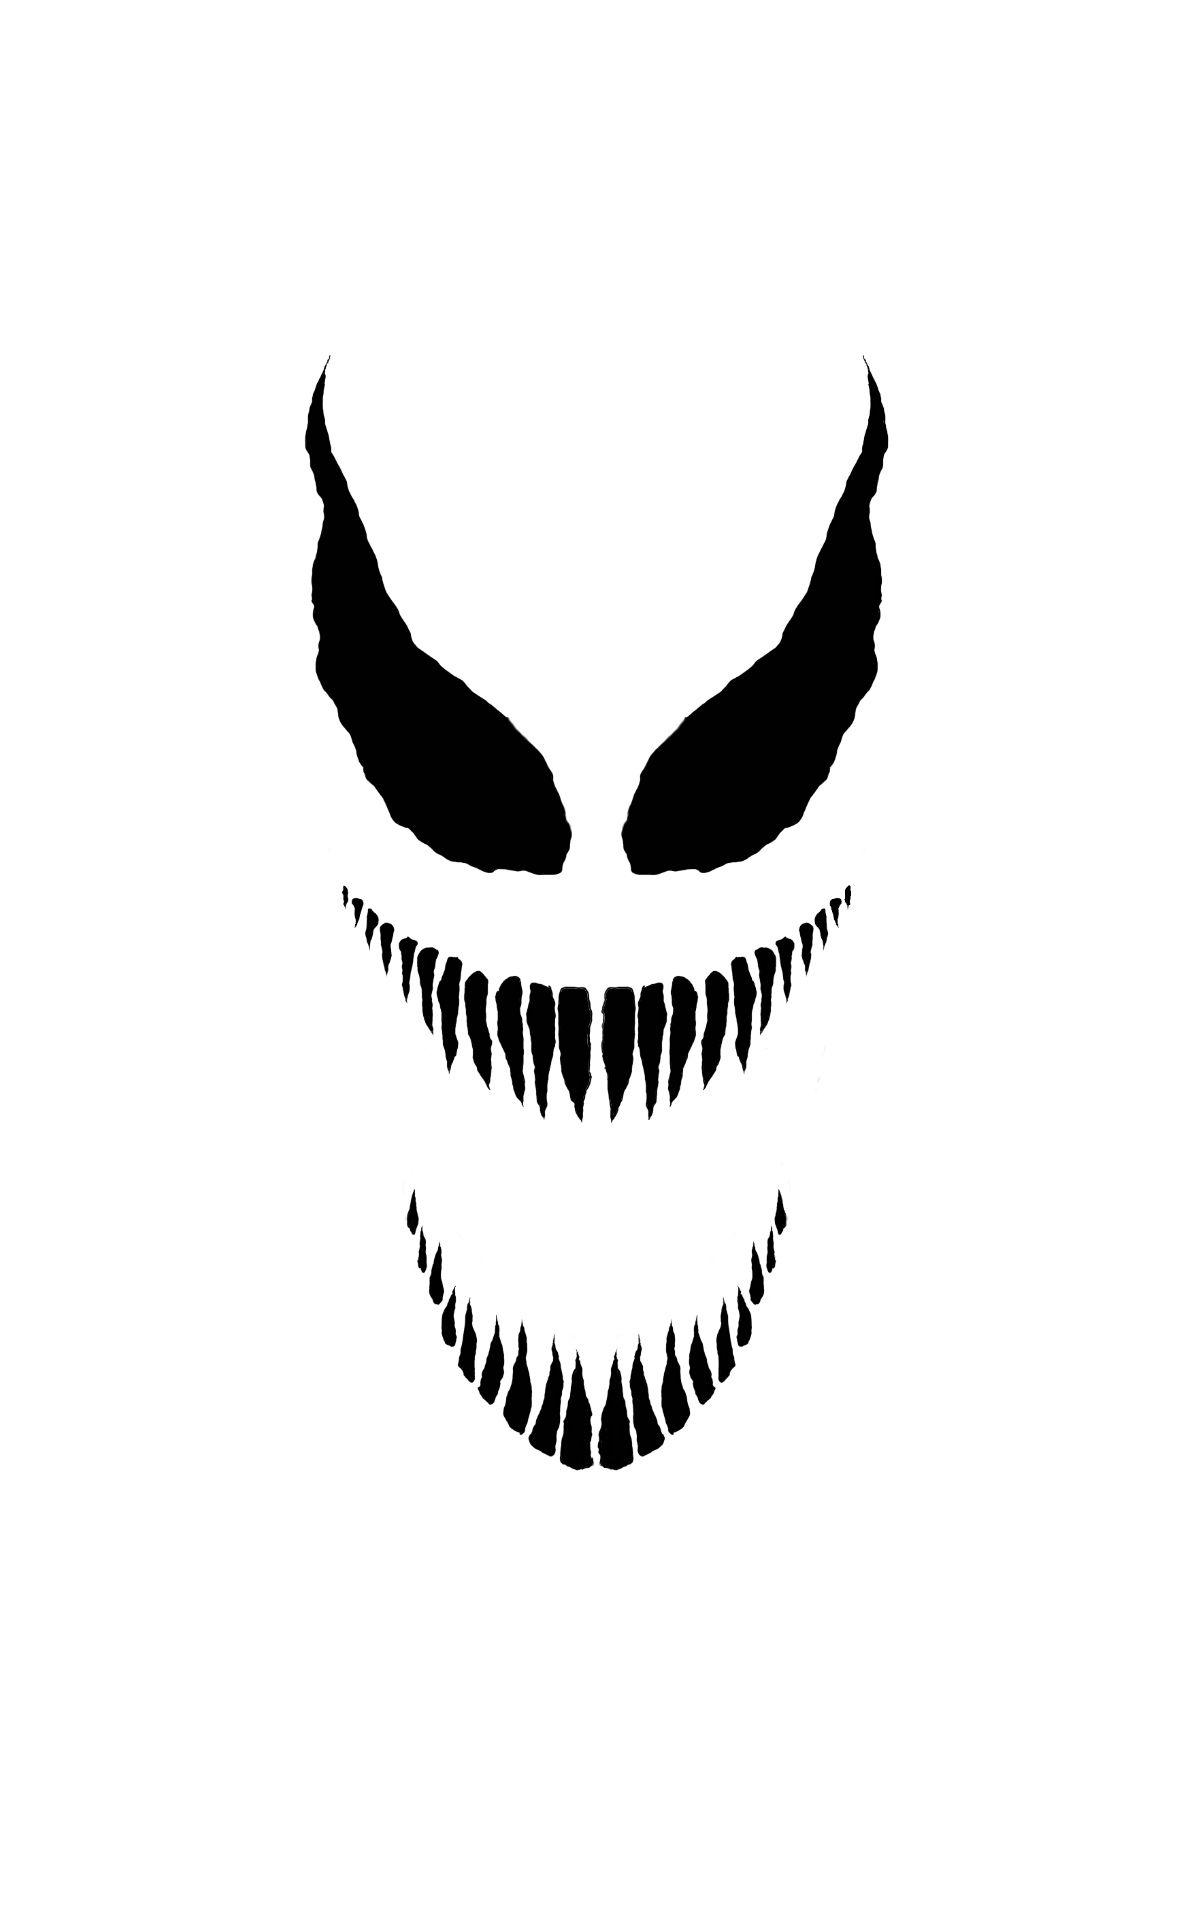 Venom Wallpaper Oled Hd Wallpapers For Pc Wallpaper Wallpaper Pc